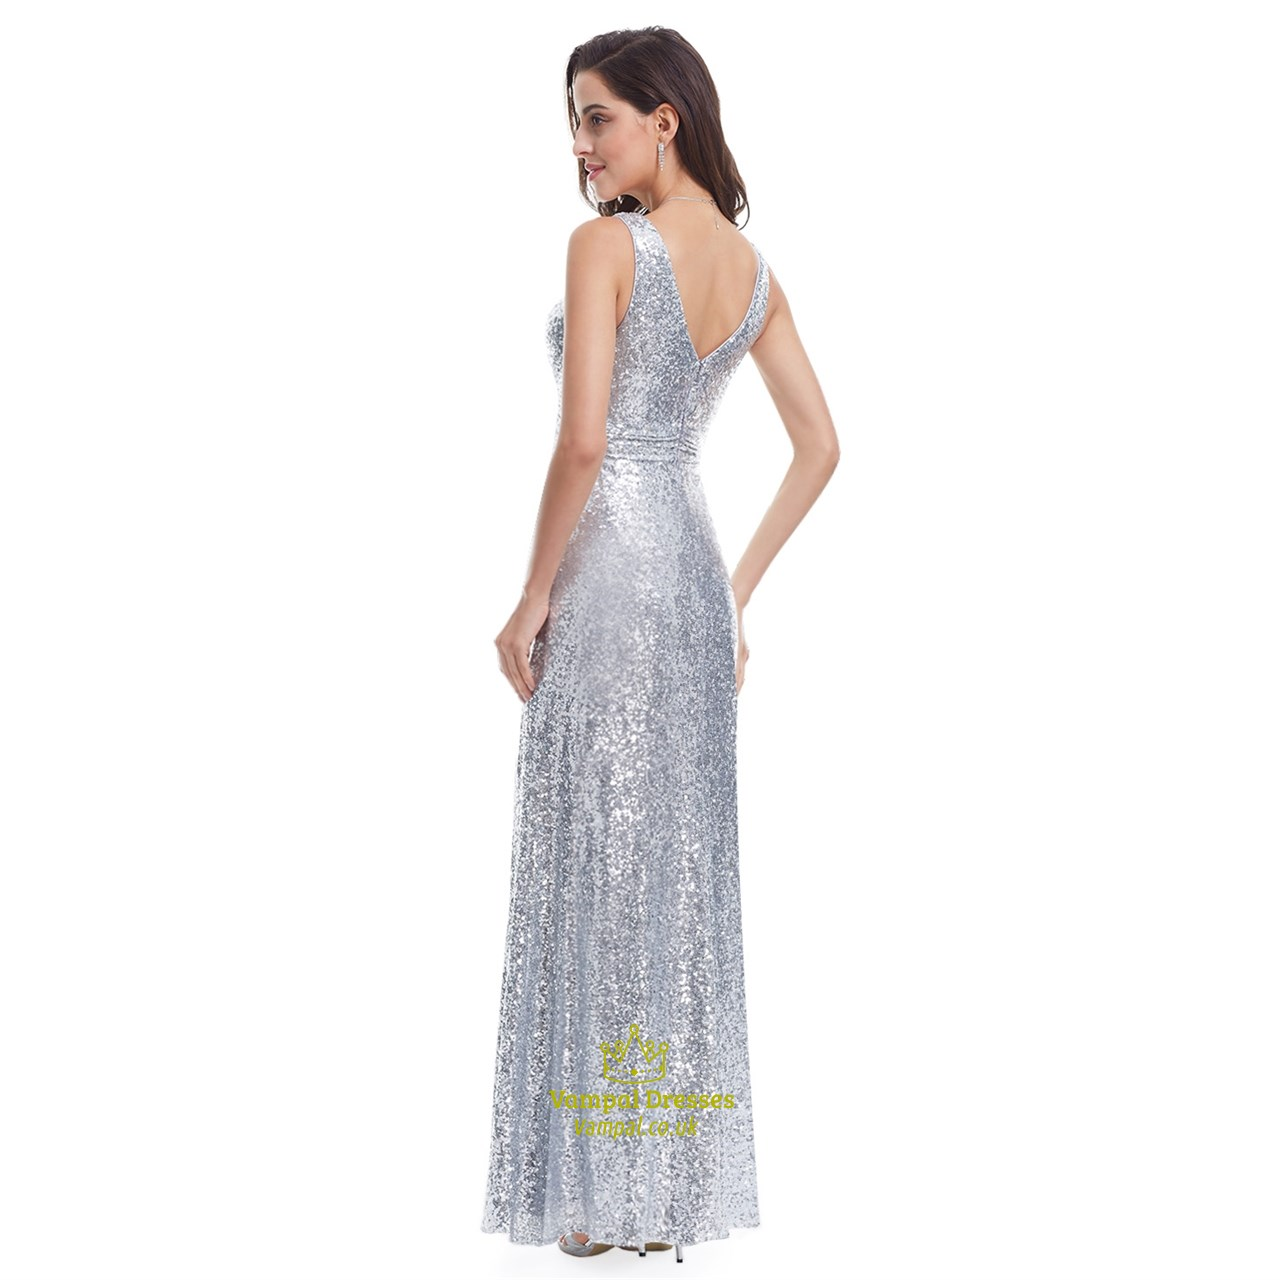 Silver V Neck Sleeveless Ruched Sequin Floor Length Formal